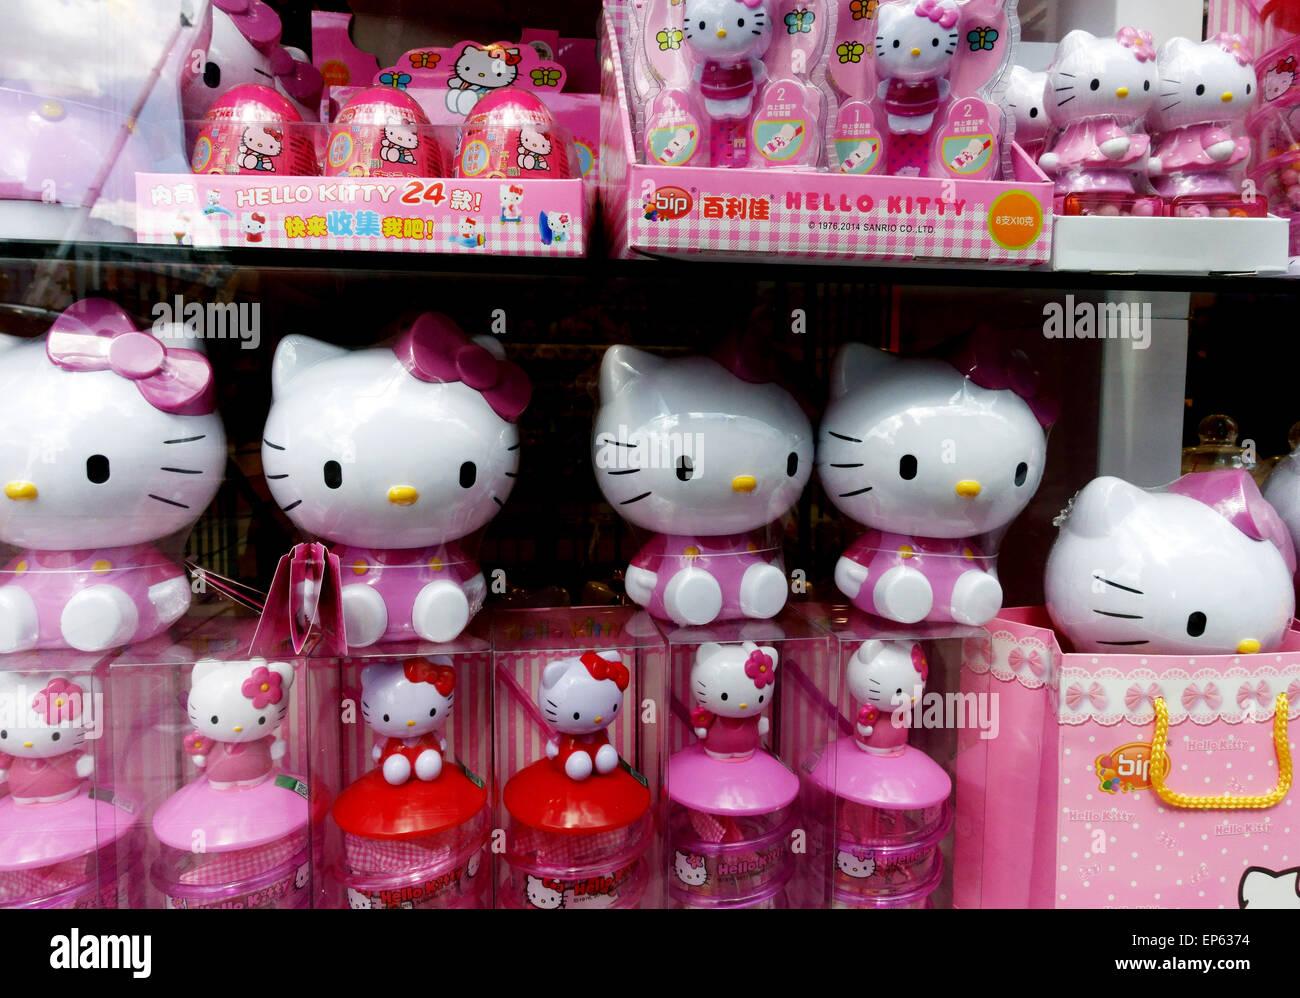 Hello Kitty Shop Stock Photos & Hello Kitty Shop Stock Images - Alamy